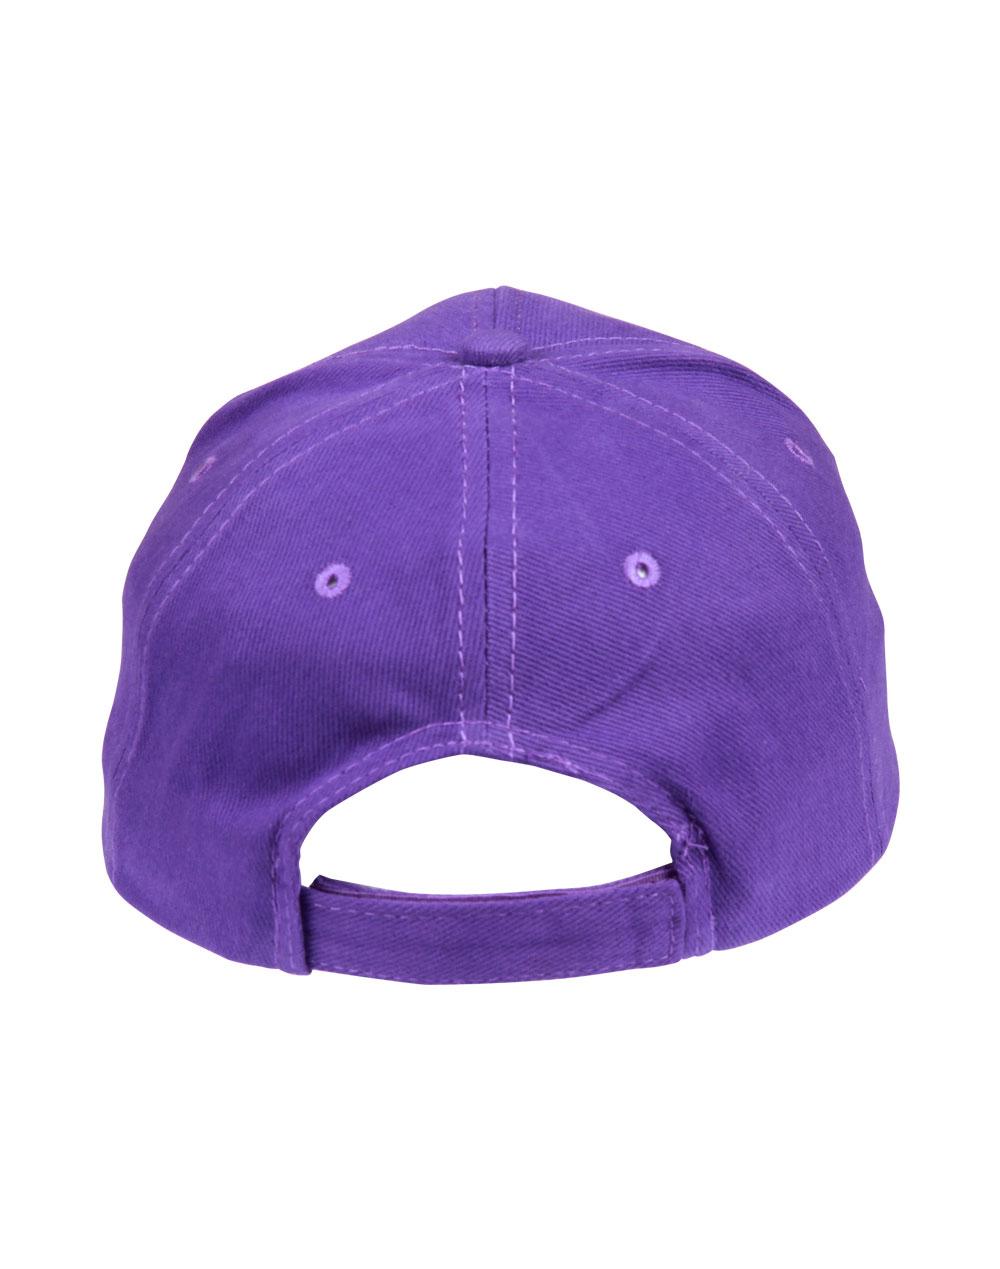 https://s3-ap-southeast-1.amazonaws.com/ws-imgs/CAPS/CH01_Purple_Back.jpg